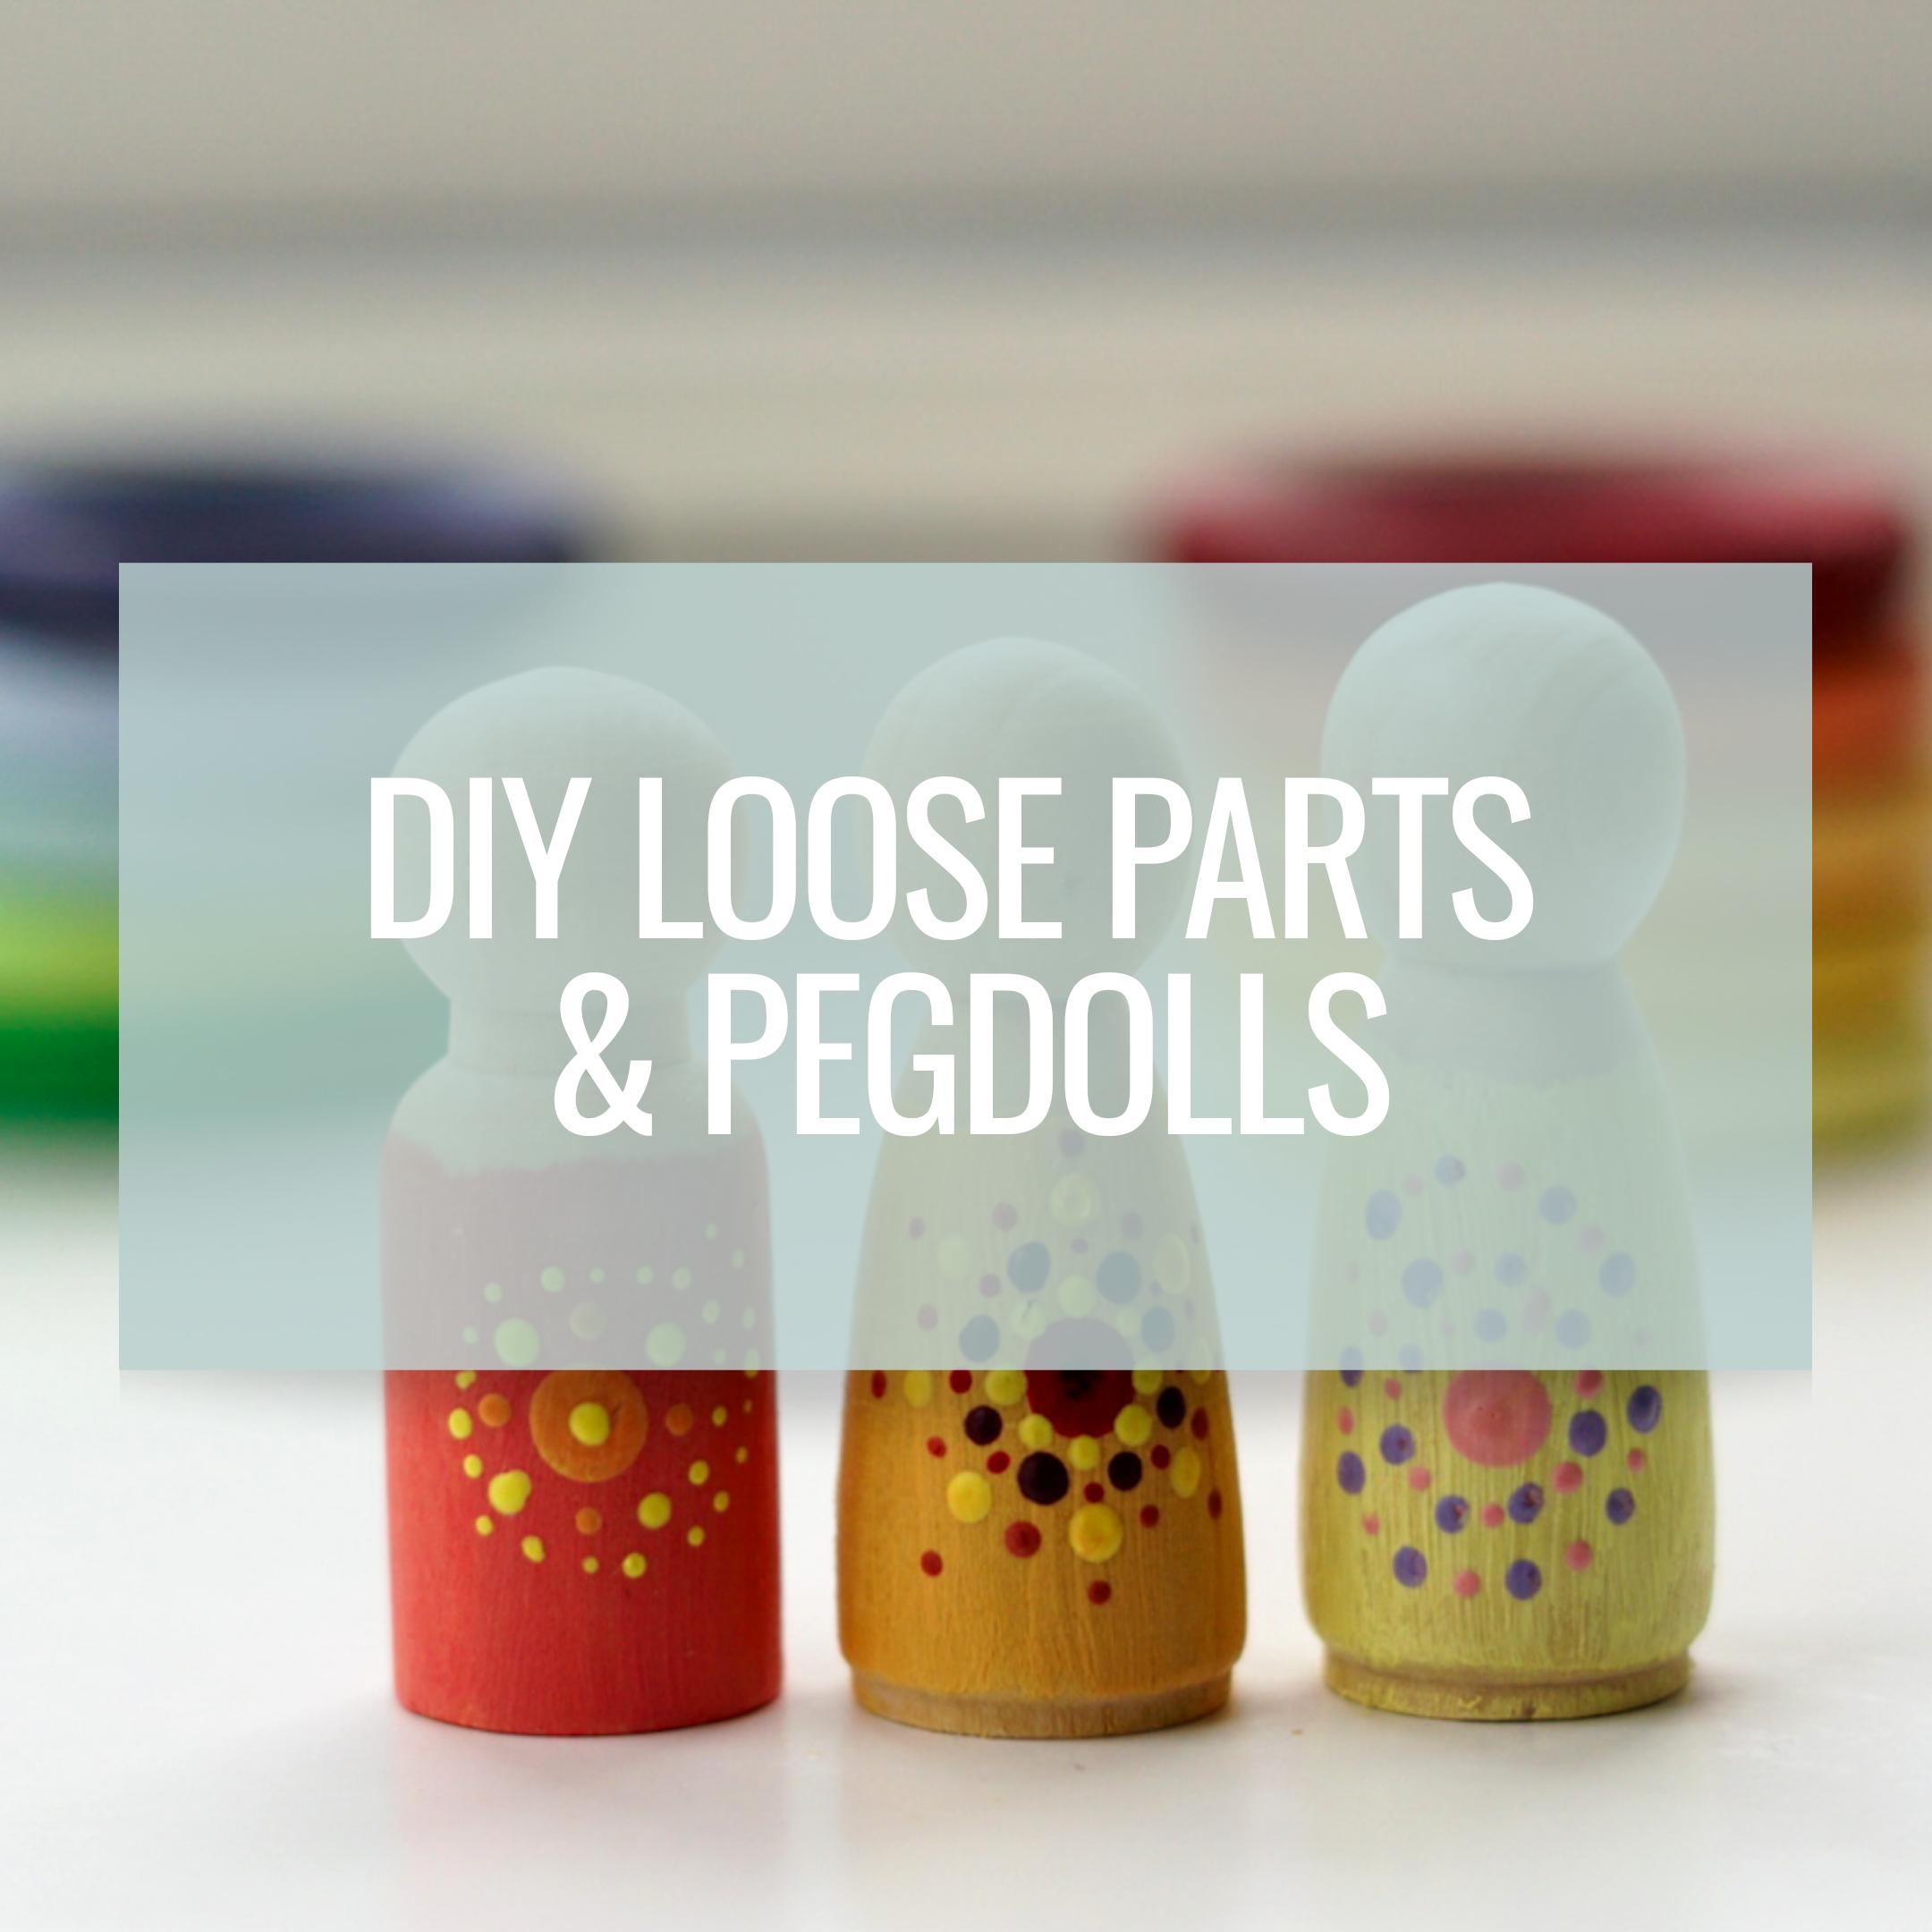 DIY loose parts & Pegdolls